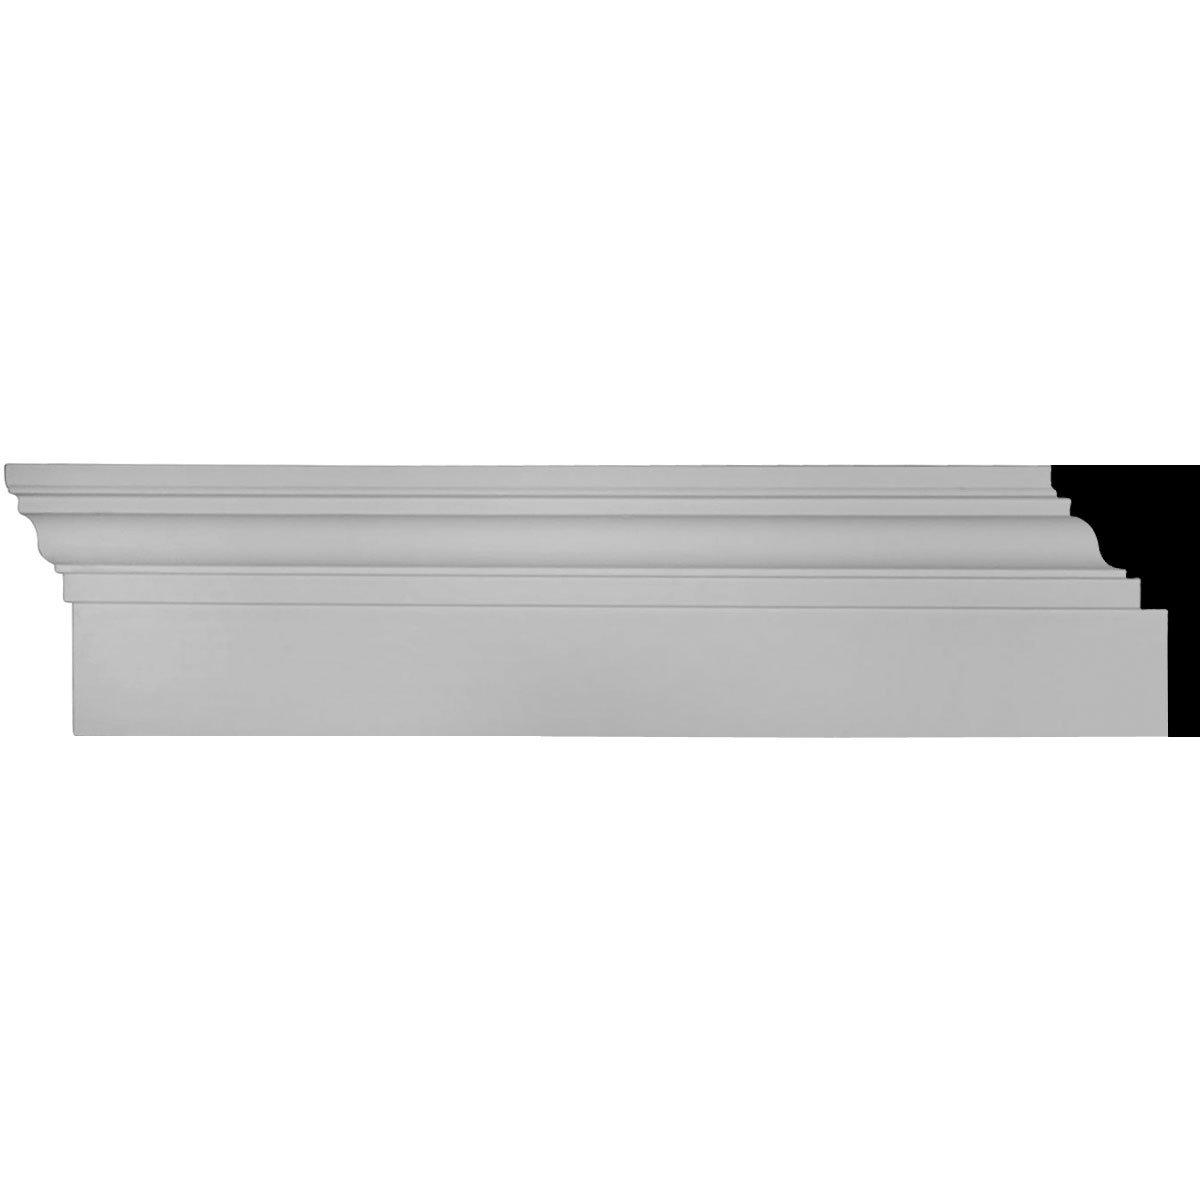 Ekena Millwork CRHM06X96TR 6-Inch x 96-Inch x 2 3/4-Inch Top Projection x 1-Inch Bottom Projection Traditional Fascia Header